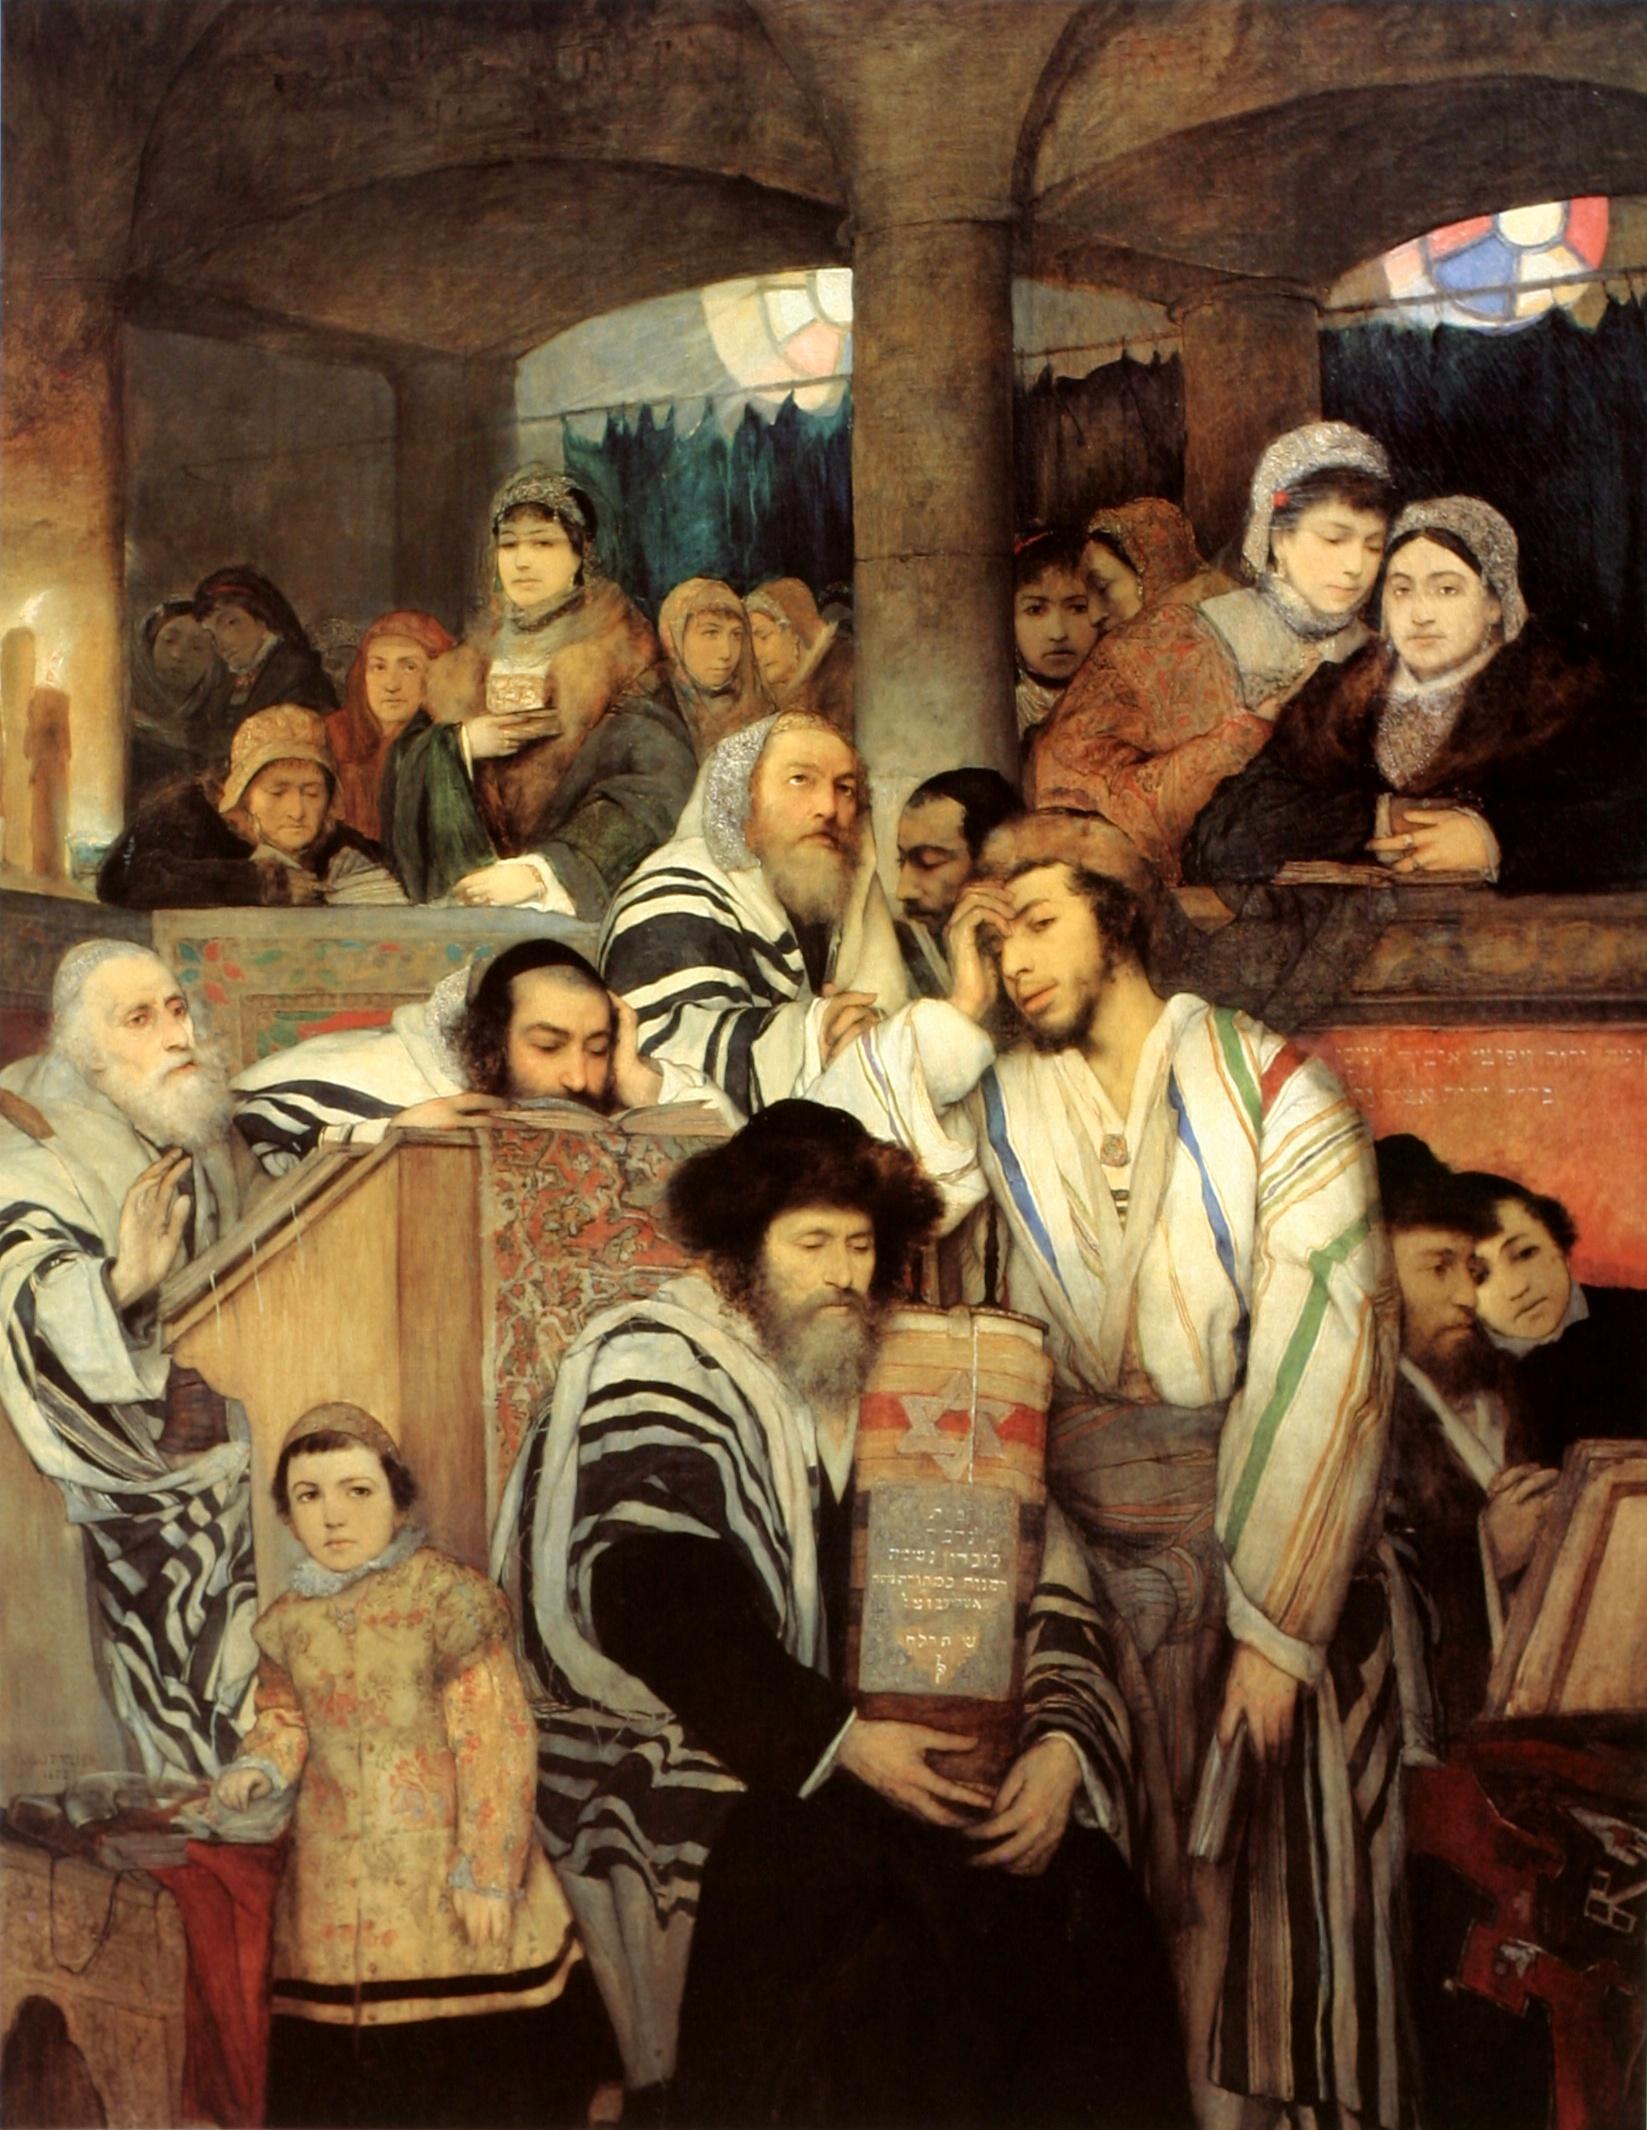 Yoel ben Shlomo – Shabbat Part 4 – Siddur, Prayer & Song